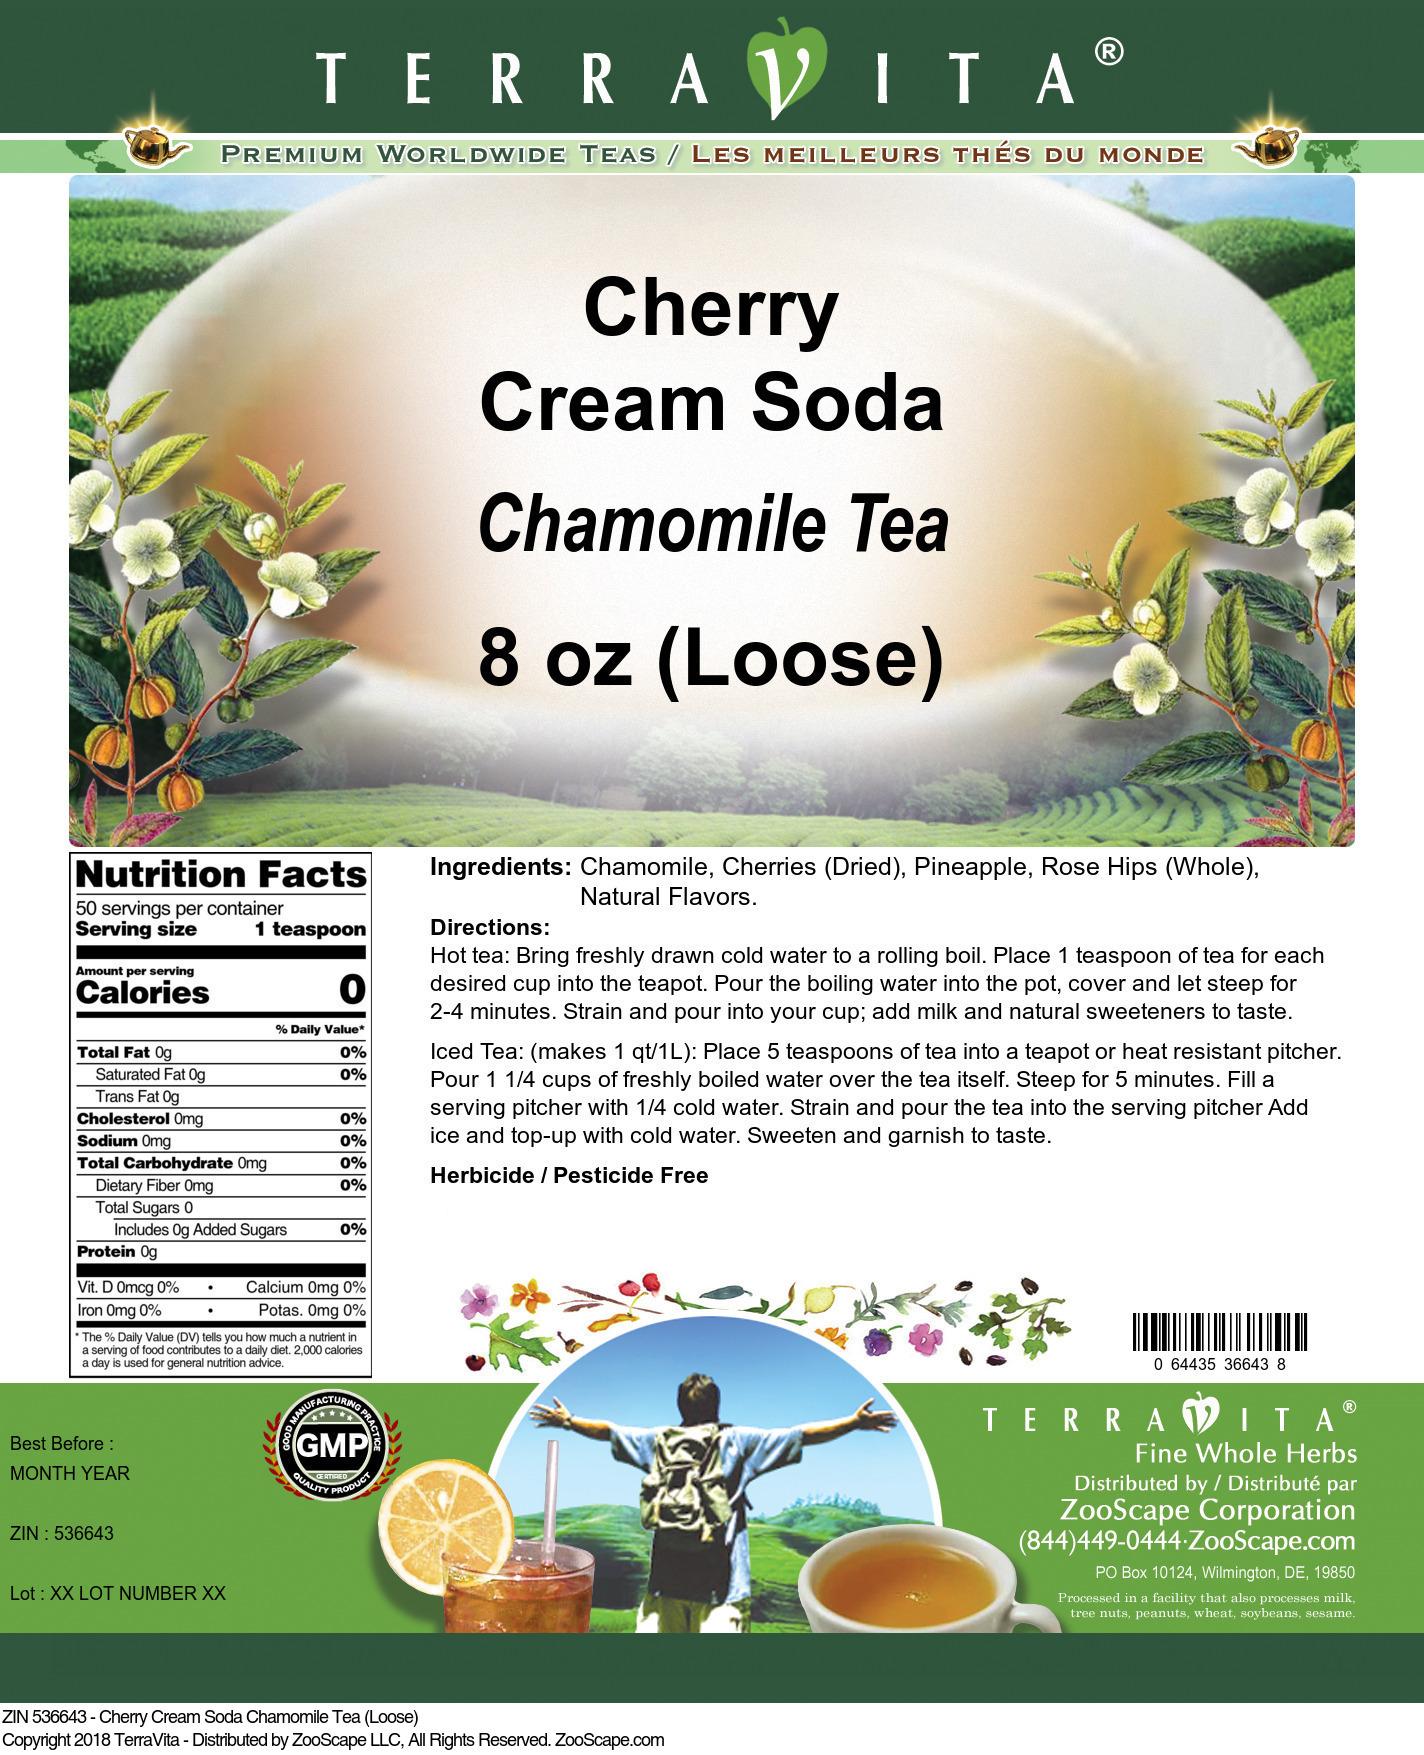 Cherry Cream Soda Chamomile Tea (Loose)